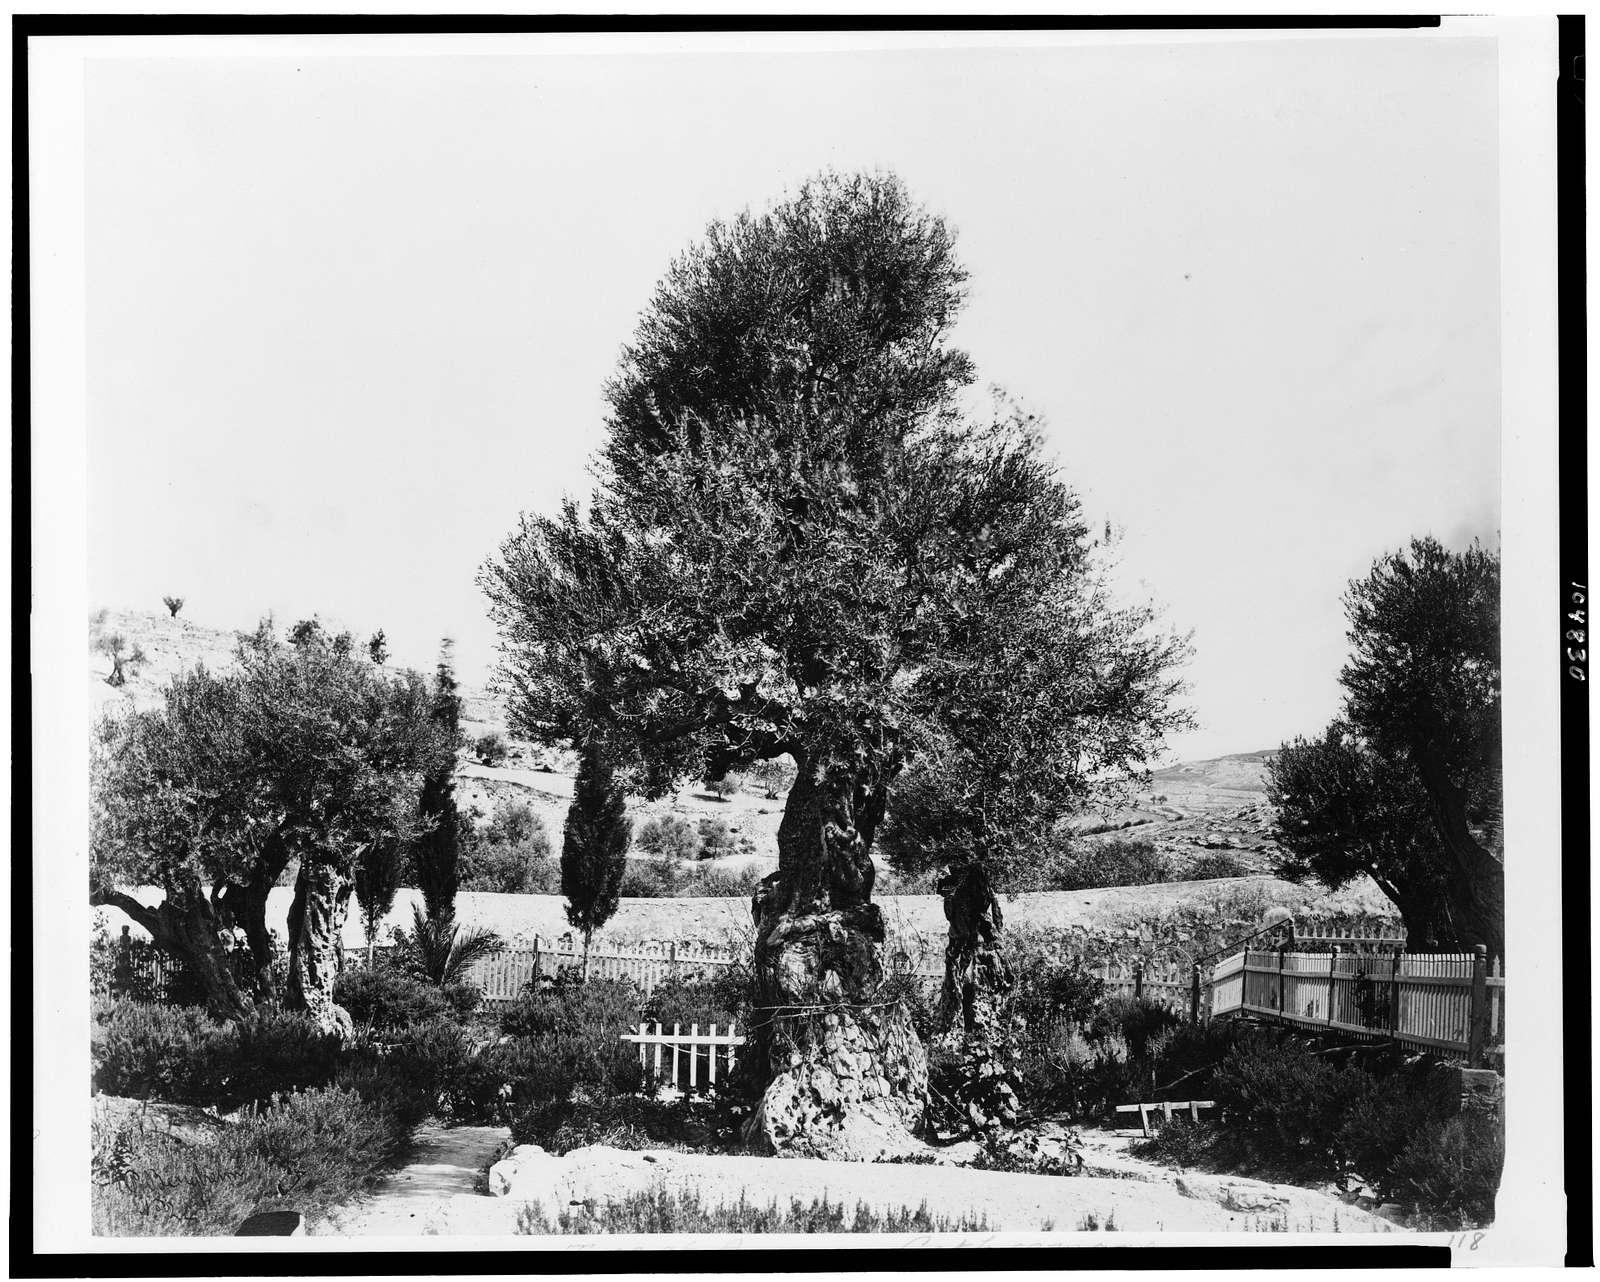 [Tree of Agony, Gethsemane] / P. Bergheim.